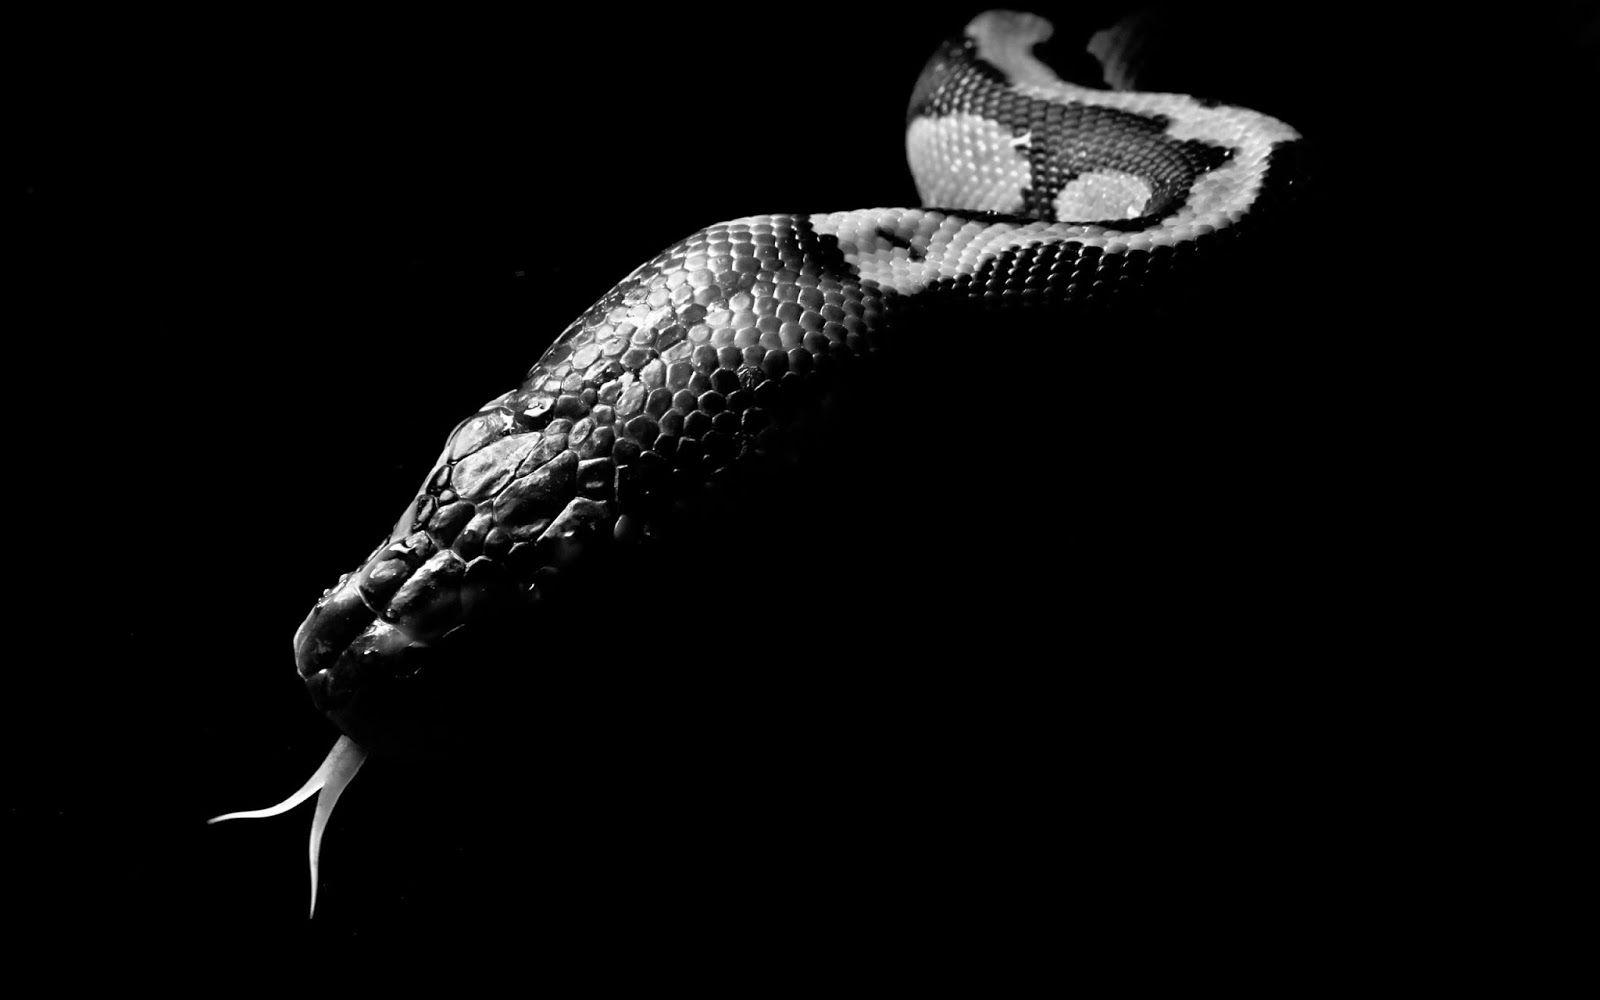 Pin By Matt Frisbie On Photo Inspiration Snake Wallpaper Snake Wallpaper